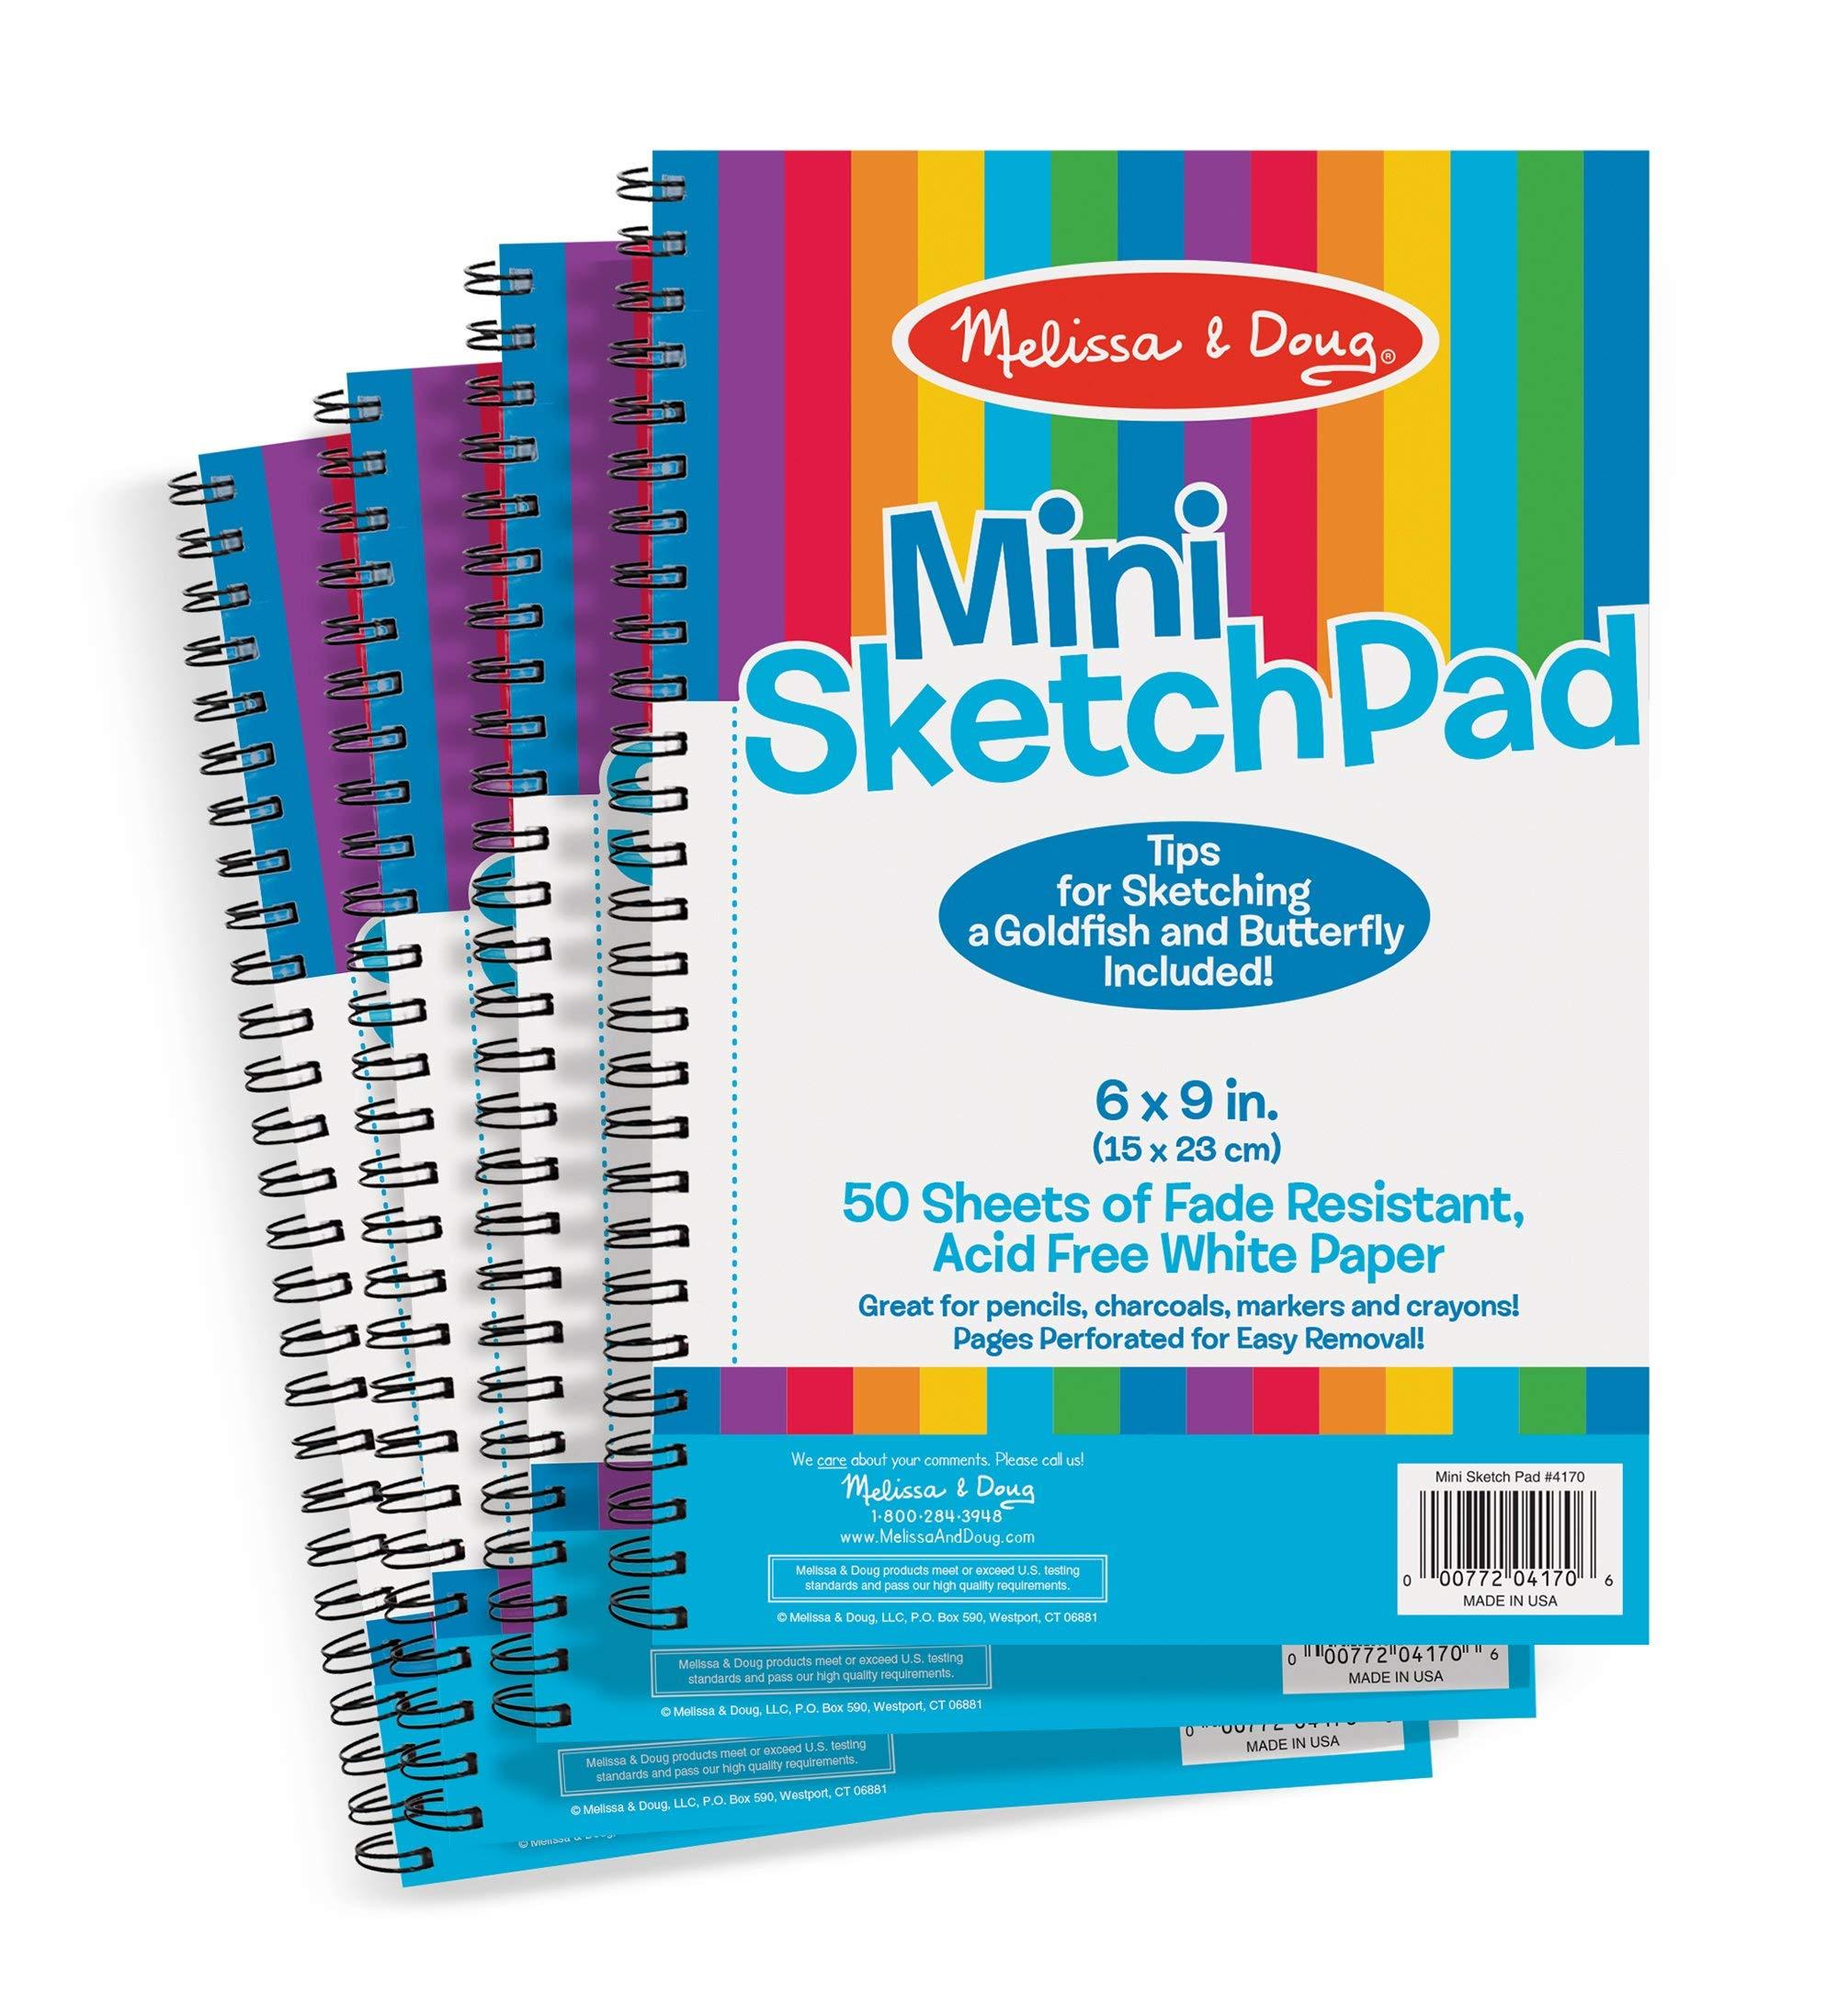 Melissa & Doug Mini-Sketch Pads, 4-Pack (Arts & Crafts, Fade-Resistant, Acid-Free White Paper, 50 Pages, 9'' H x 6'' W x 0.25'' L) by Melissa & Doug